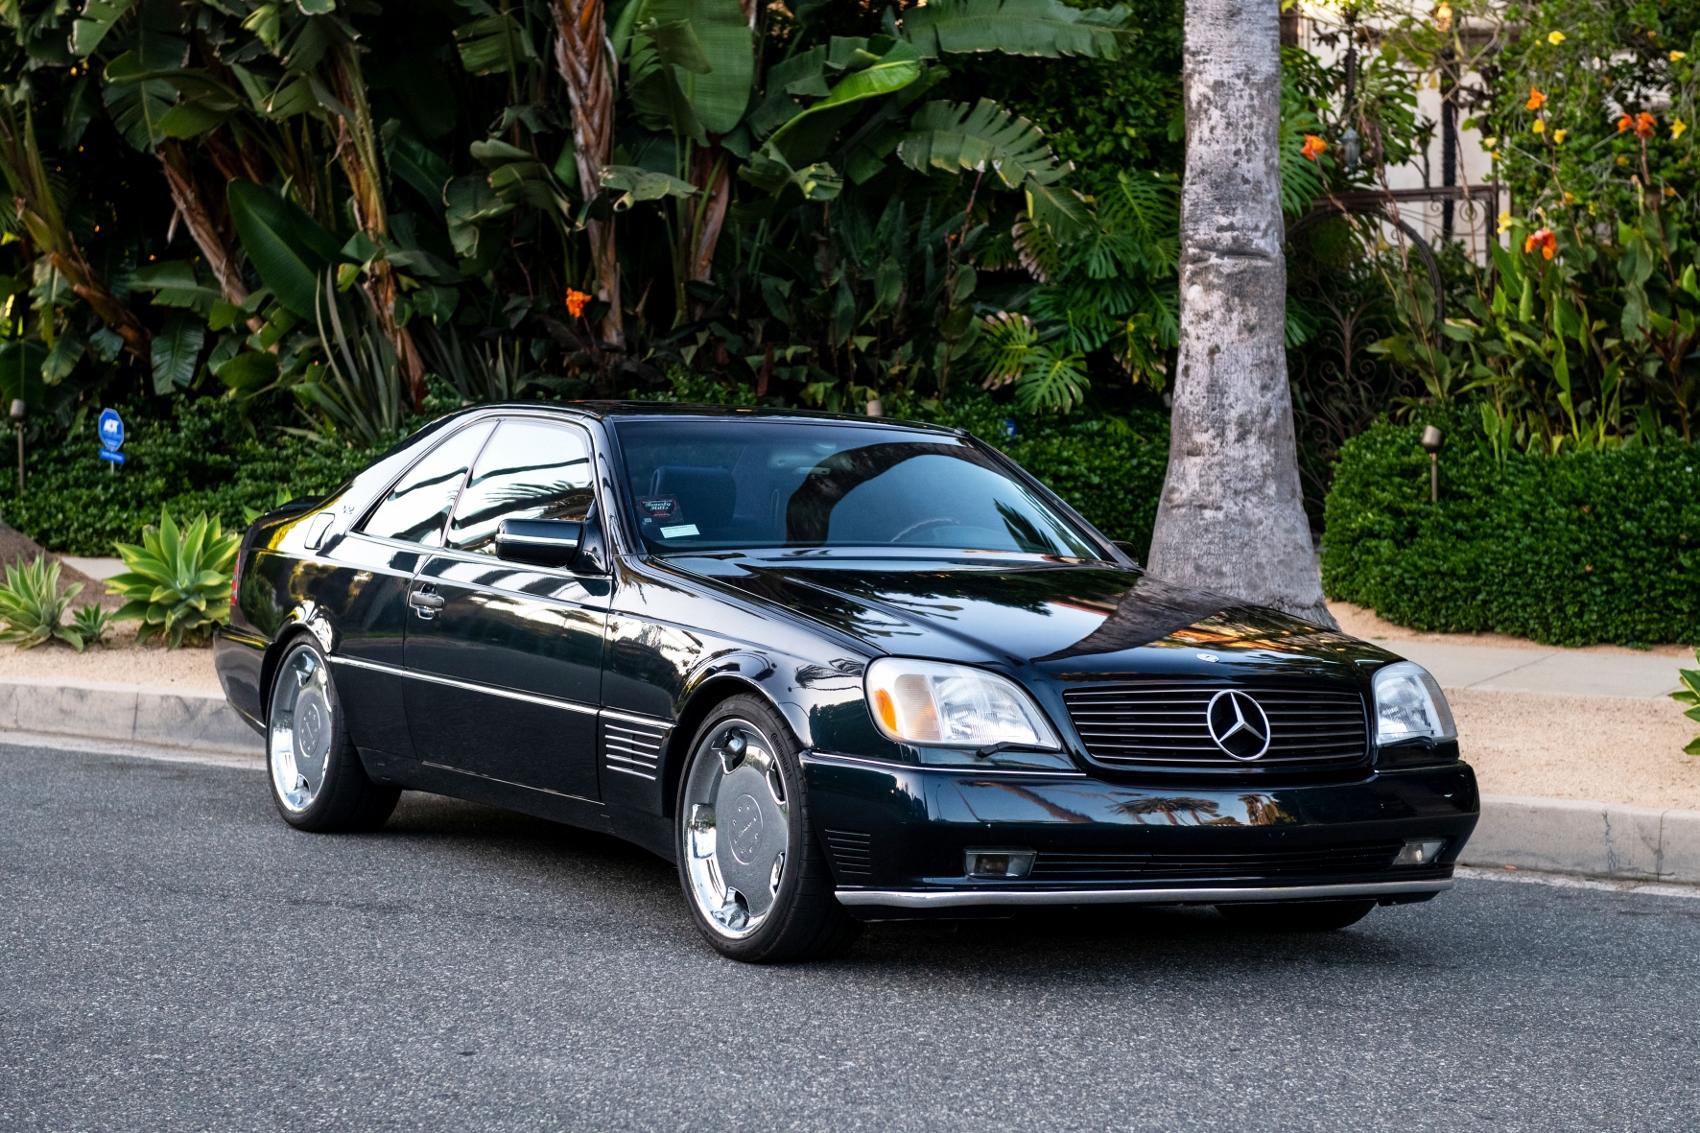 Pozrite si Mercedes S600 Michaela Jordana z roku 1996 KEJT6rdLww lorinsercl600ex-jordanfrontdiagonal